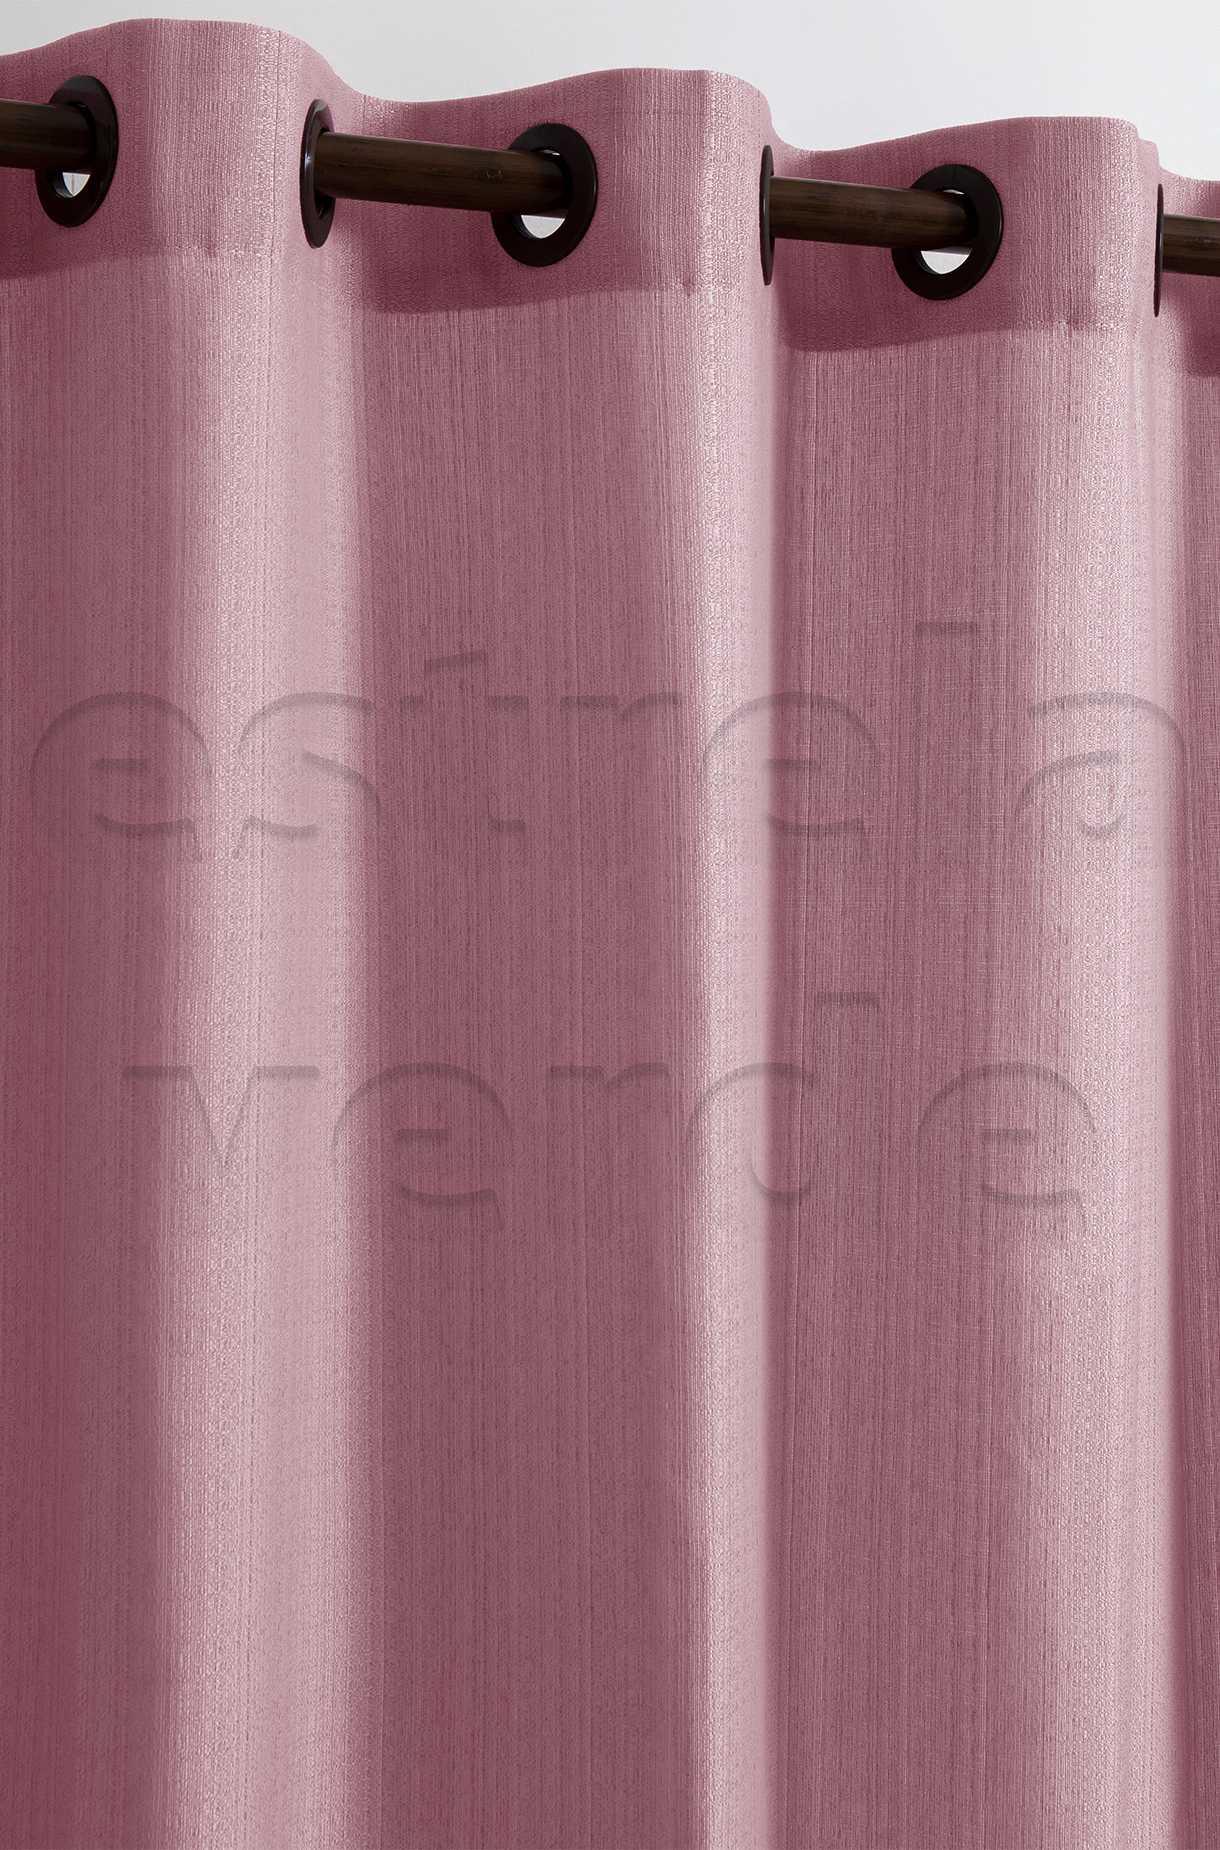 CORTINA VENEZA 2,60X1,70 5172 ROSE  - Estrela Verde